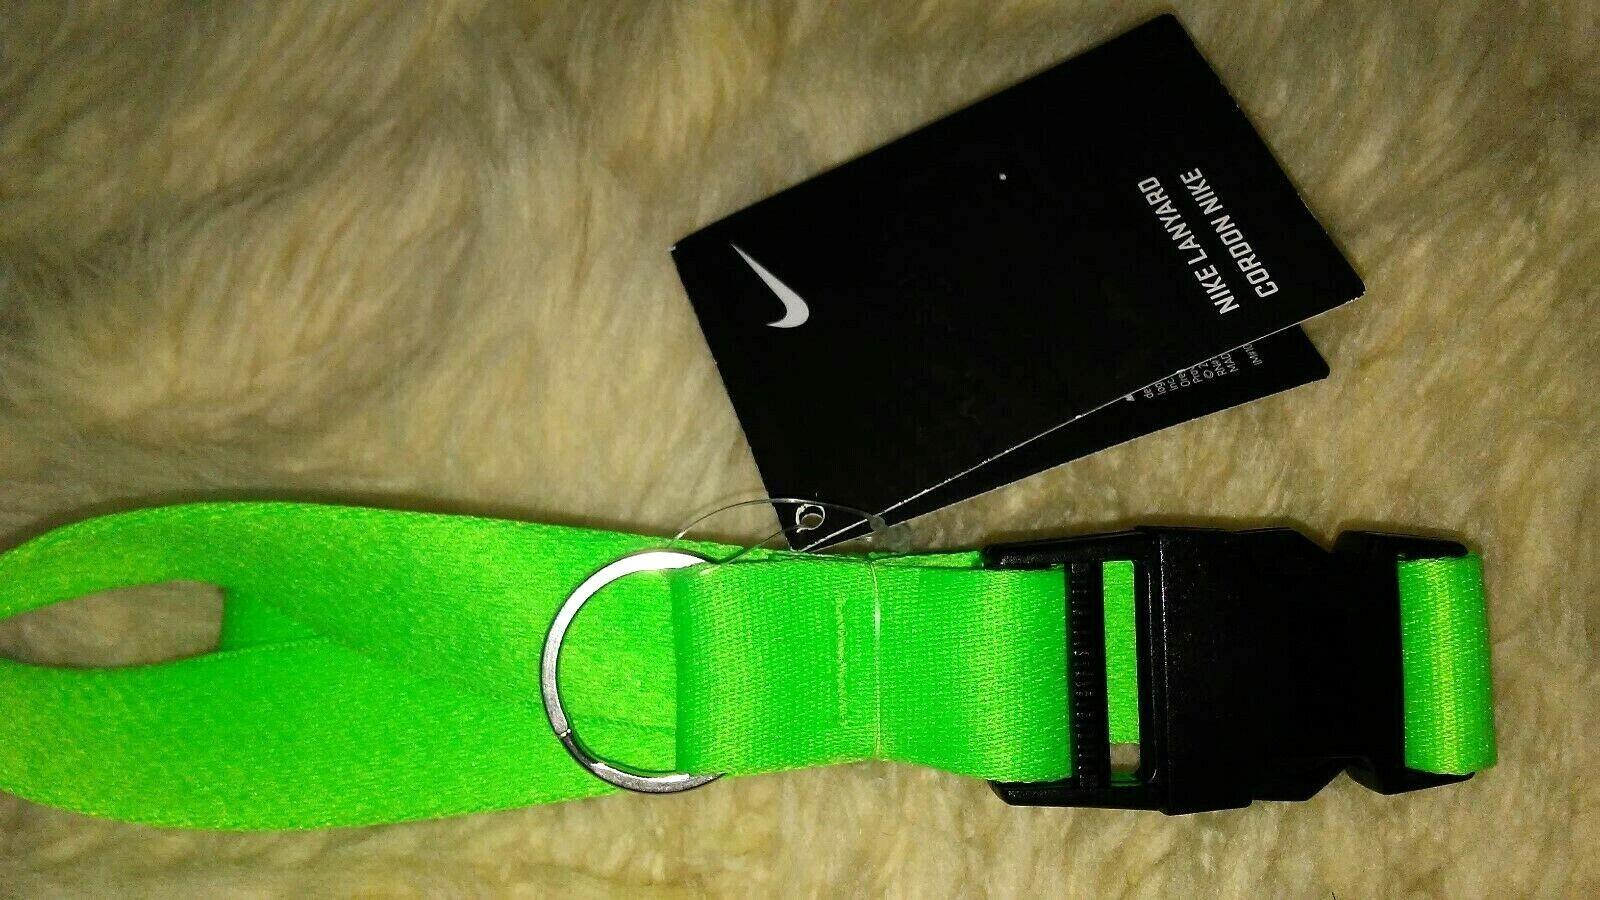 Green //Black, One Size NK Lanyard AC3582-385